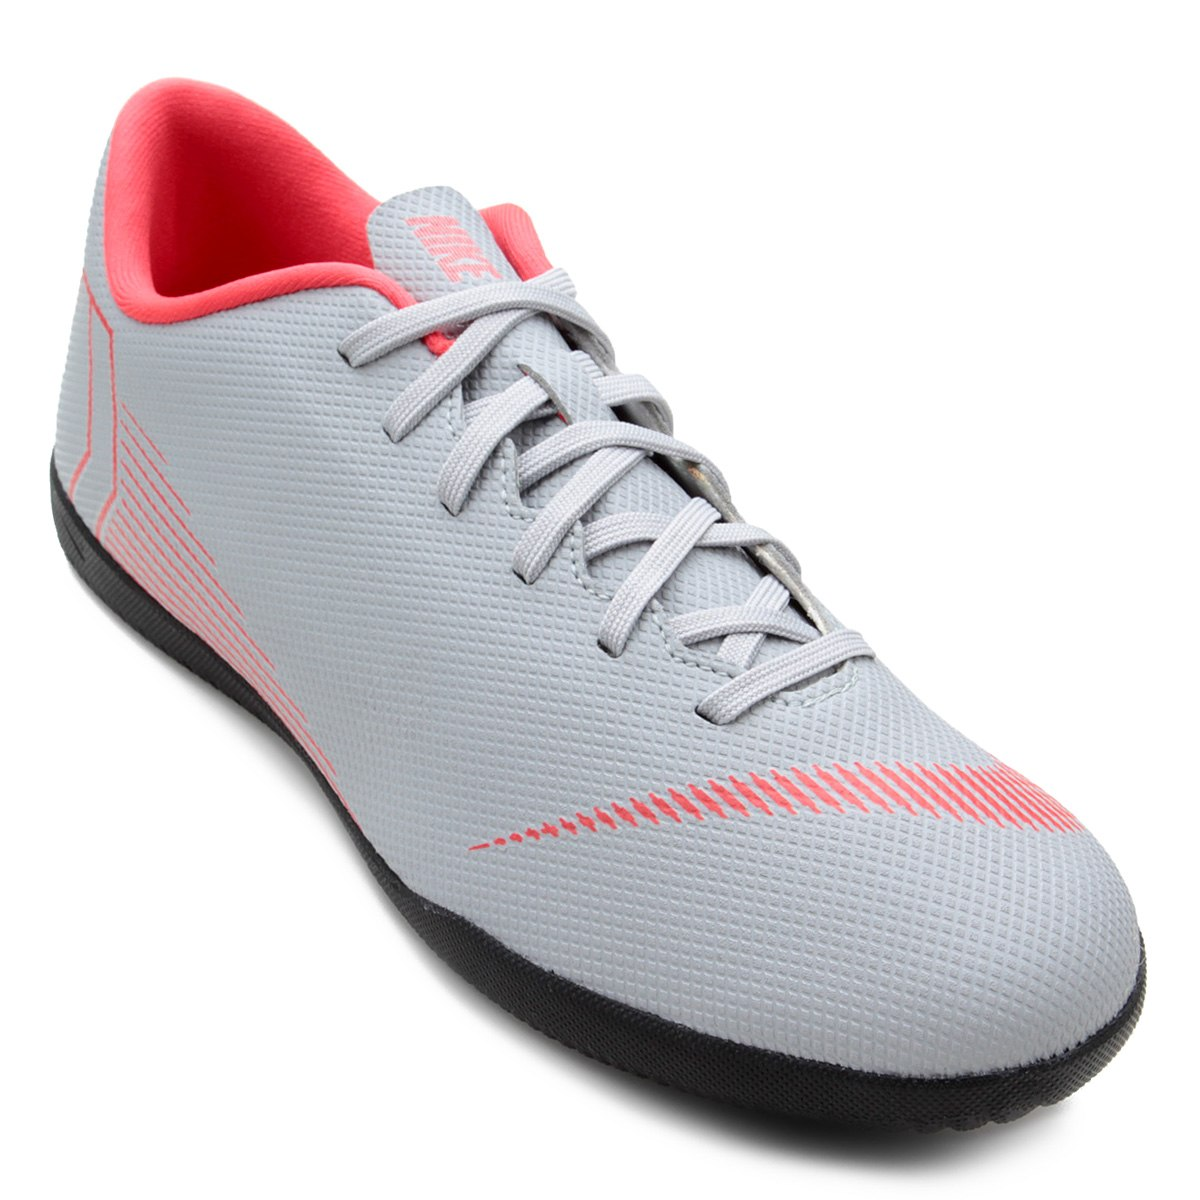 Chuteira Nike Mercurial Vapor 12 Club IC